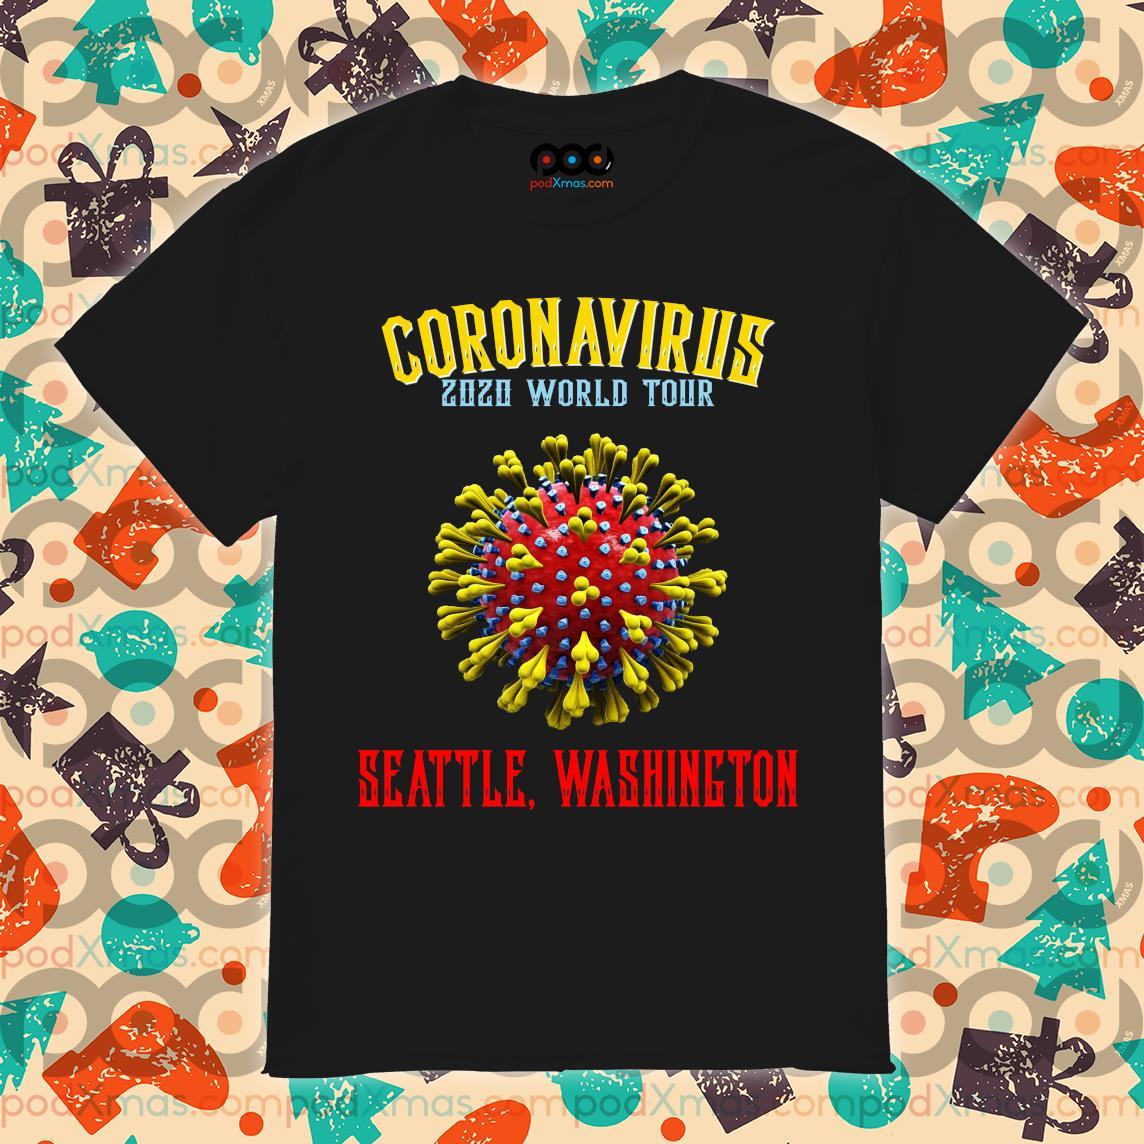 Coronavirus 2020 world tour seattle Washington shirt